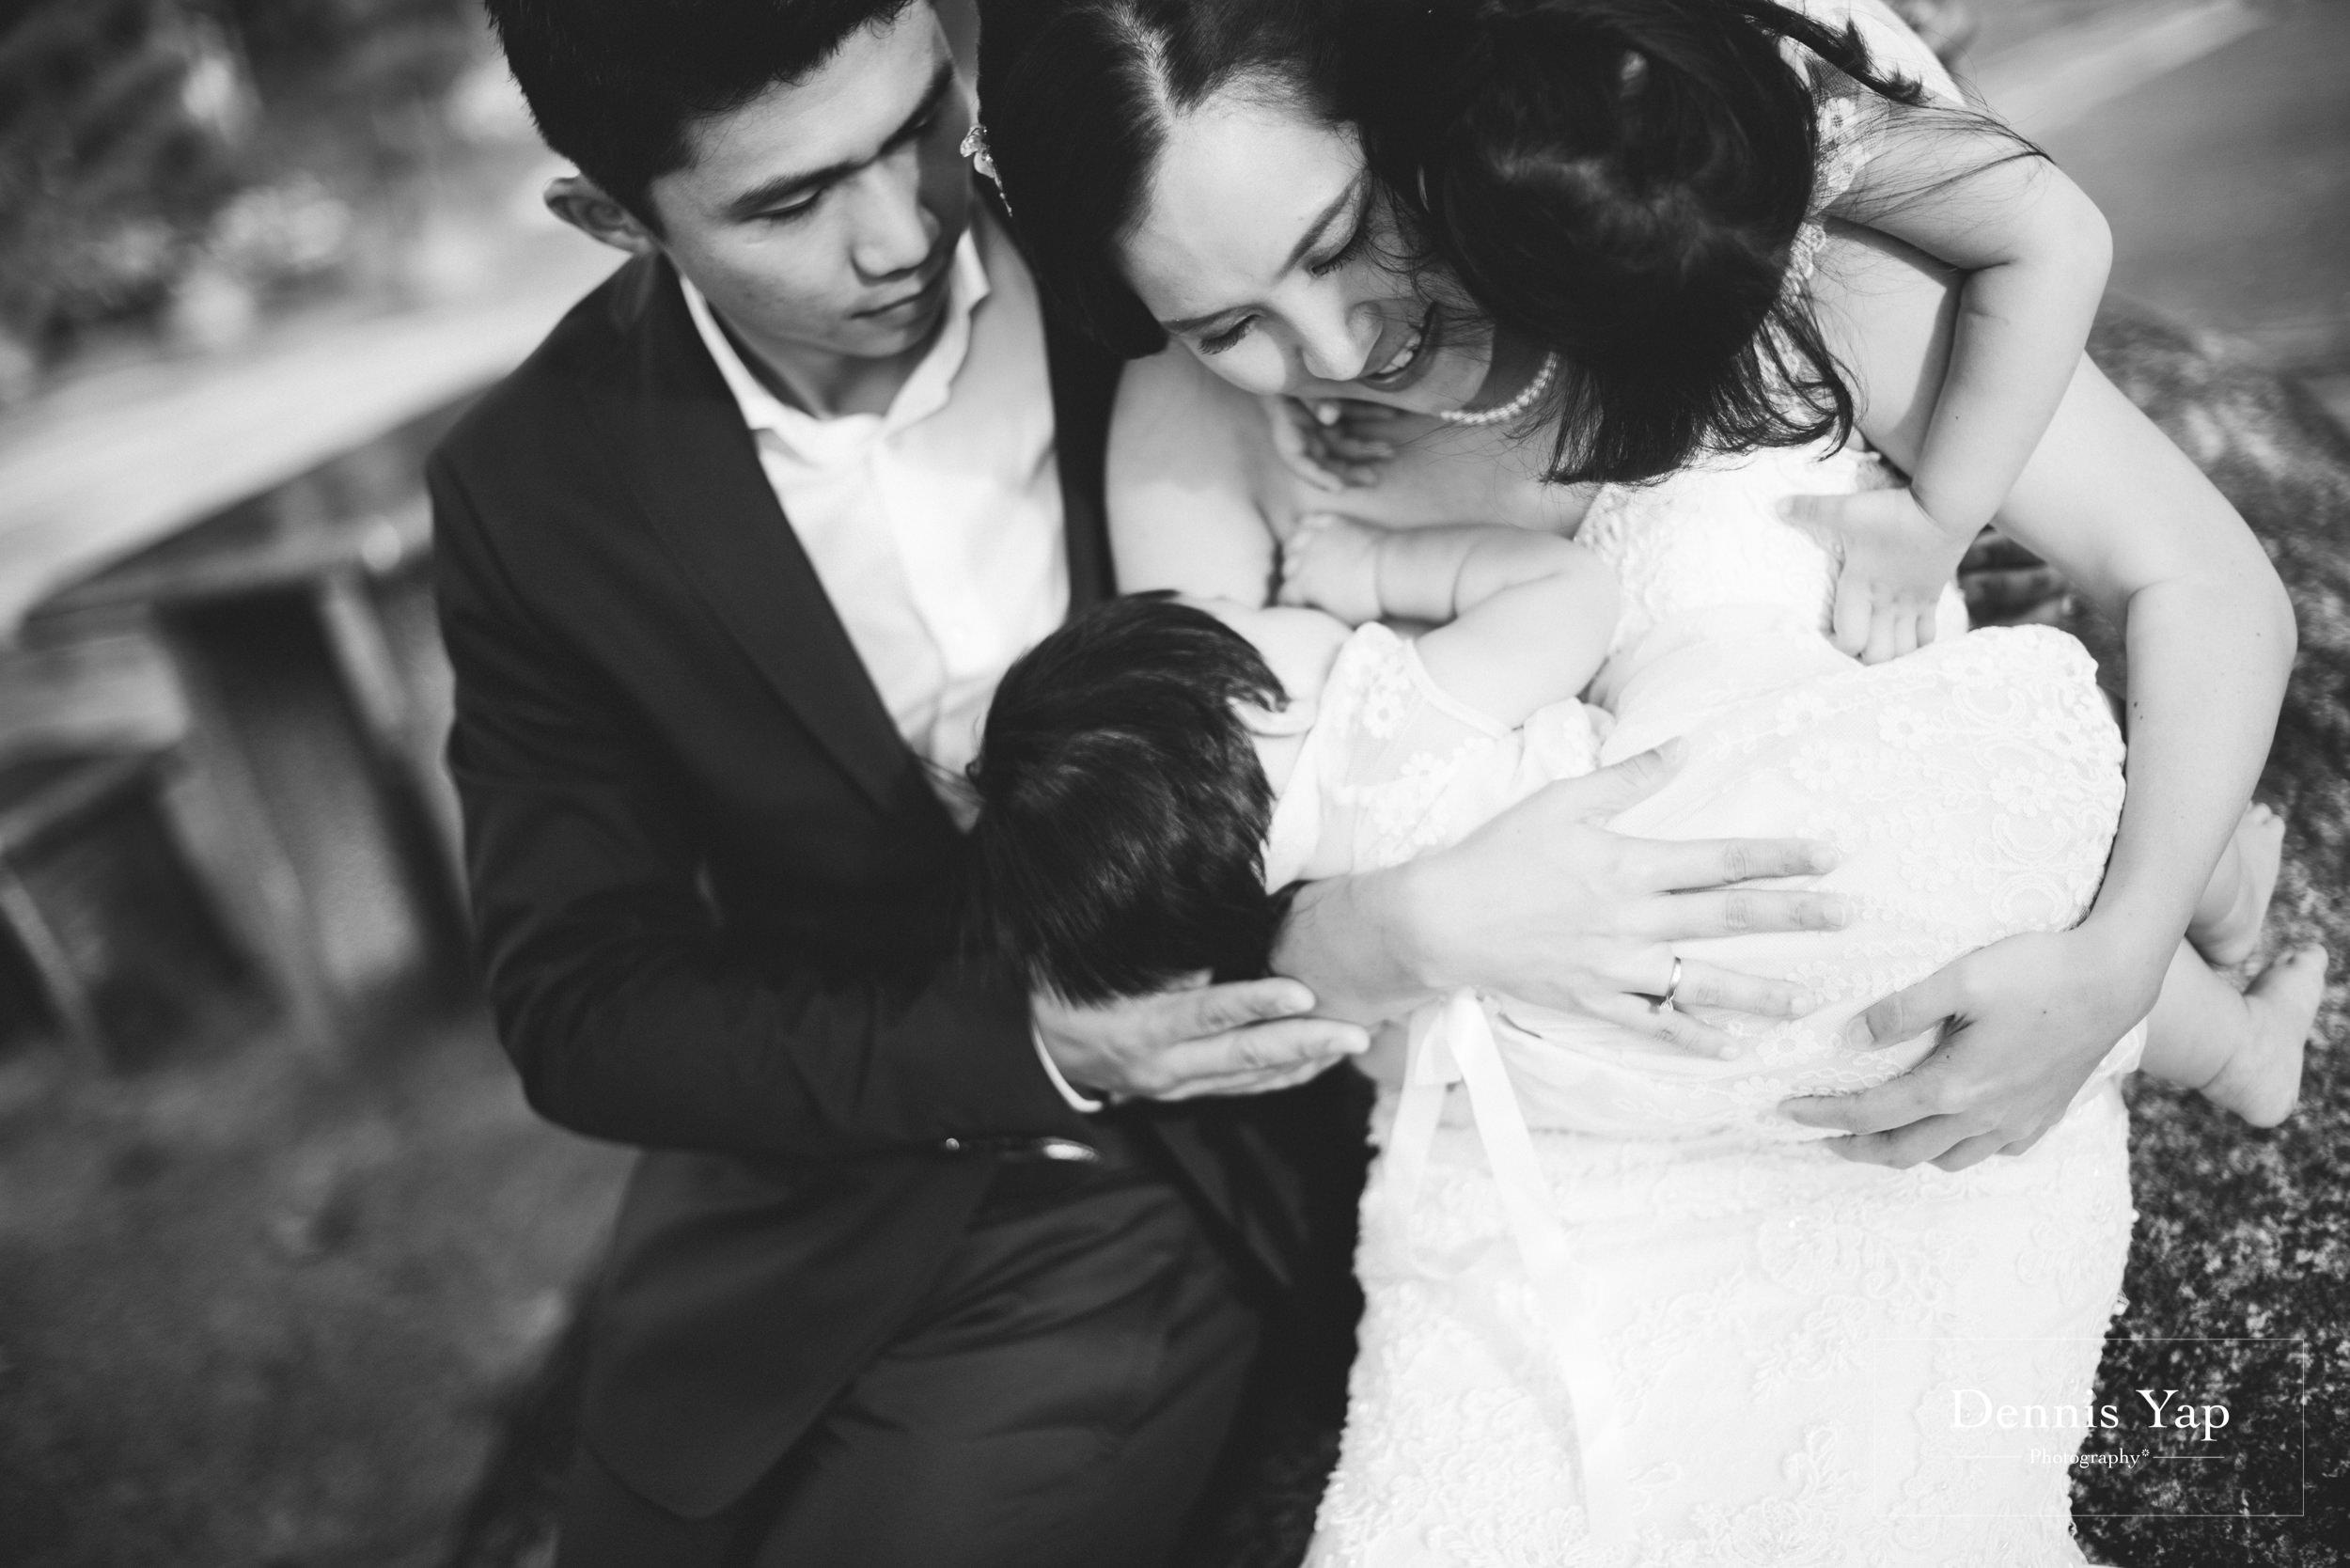 jung munn yein prewedding baby family dennis yap photography janda baik-4.jpg